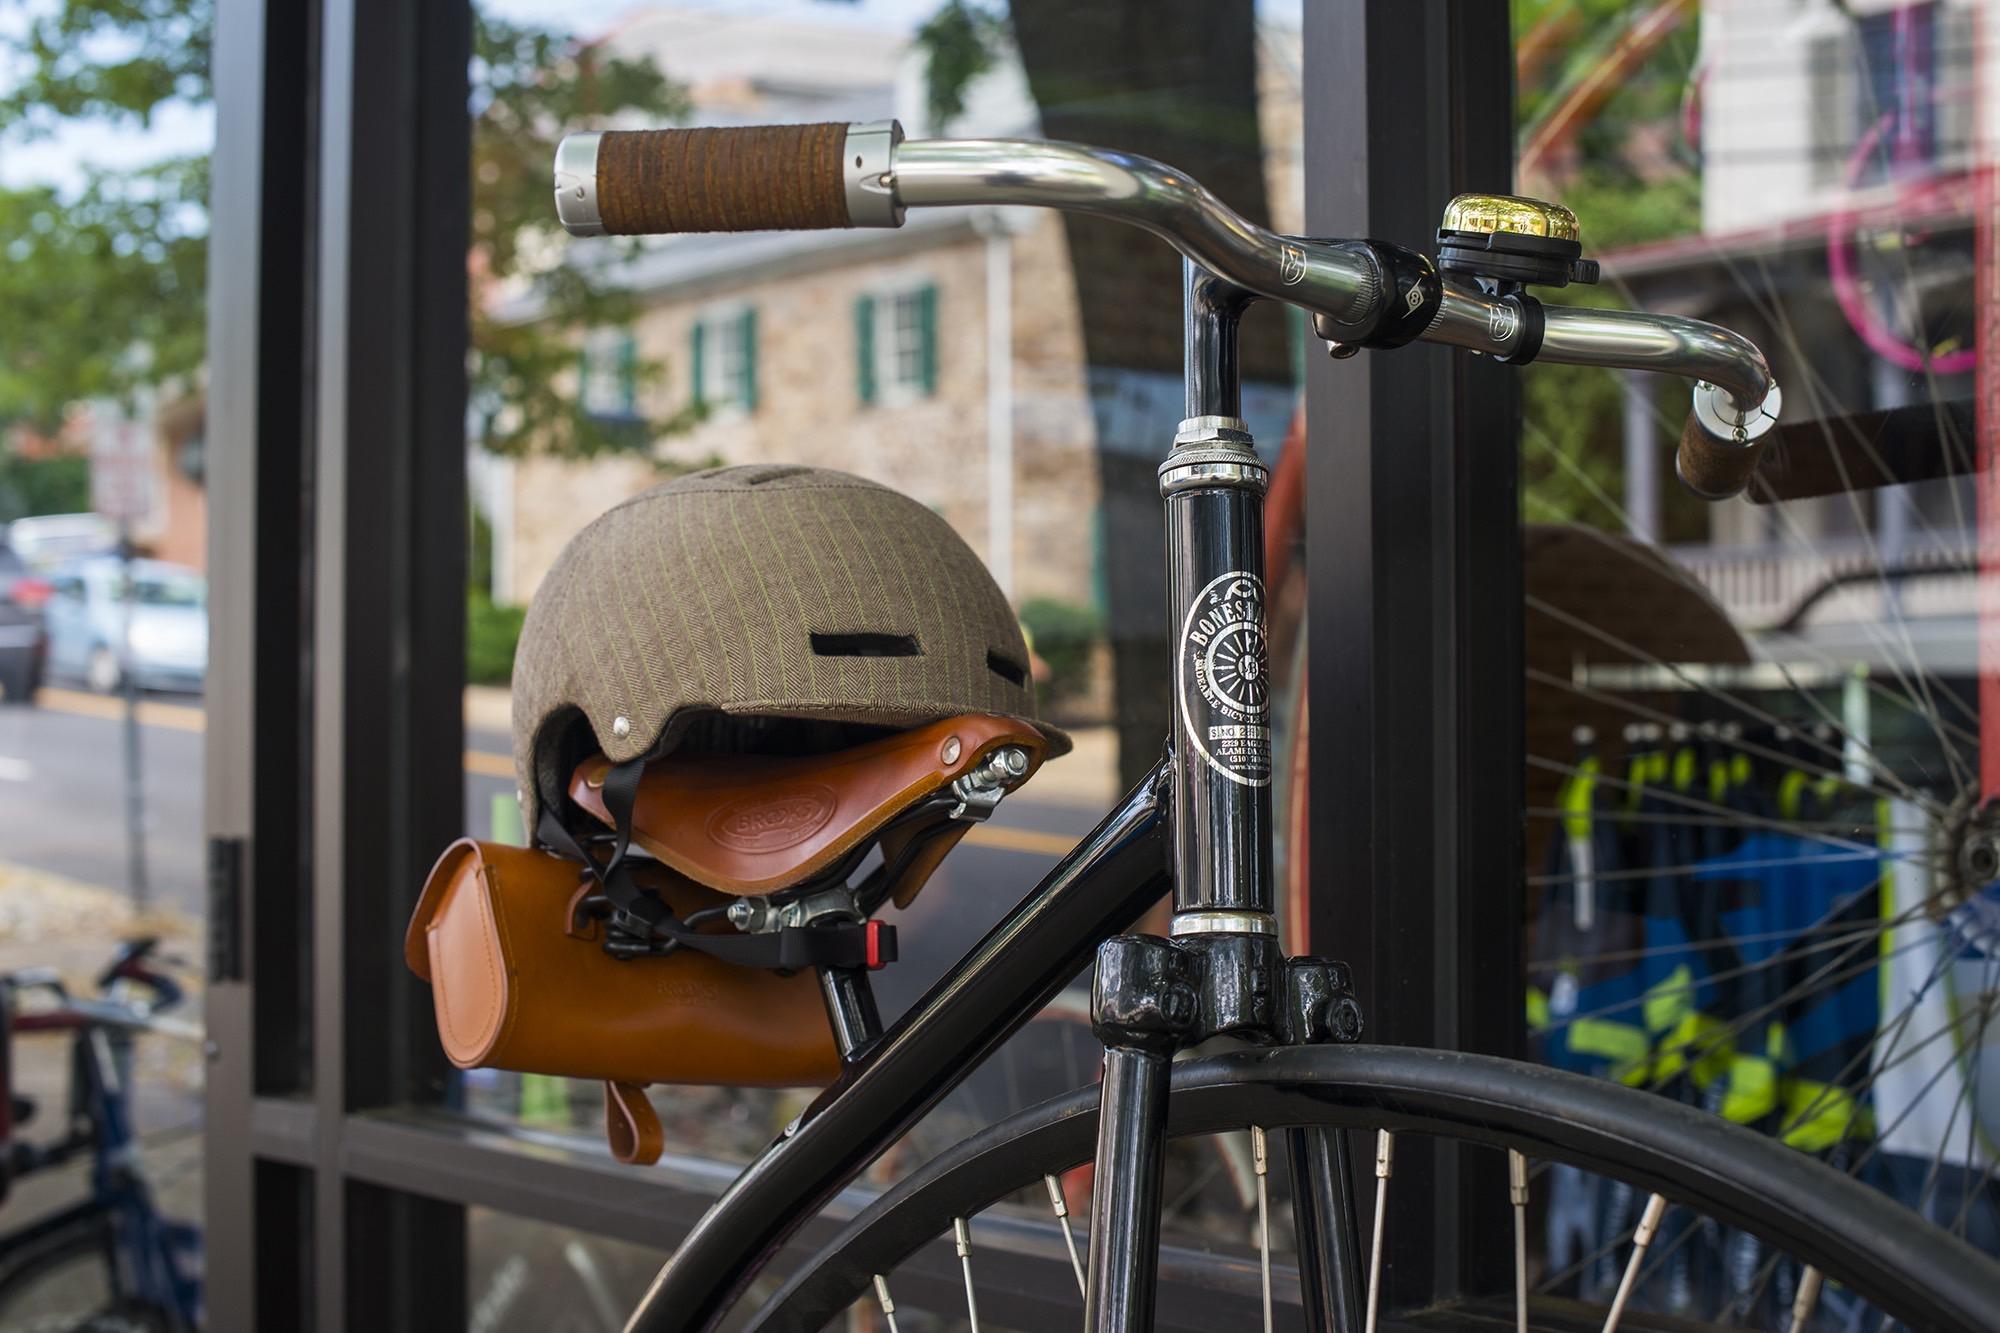 Highwheel bike in Doylestown